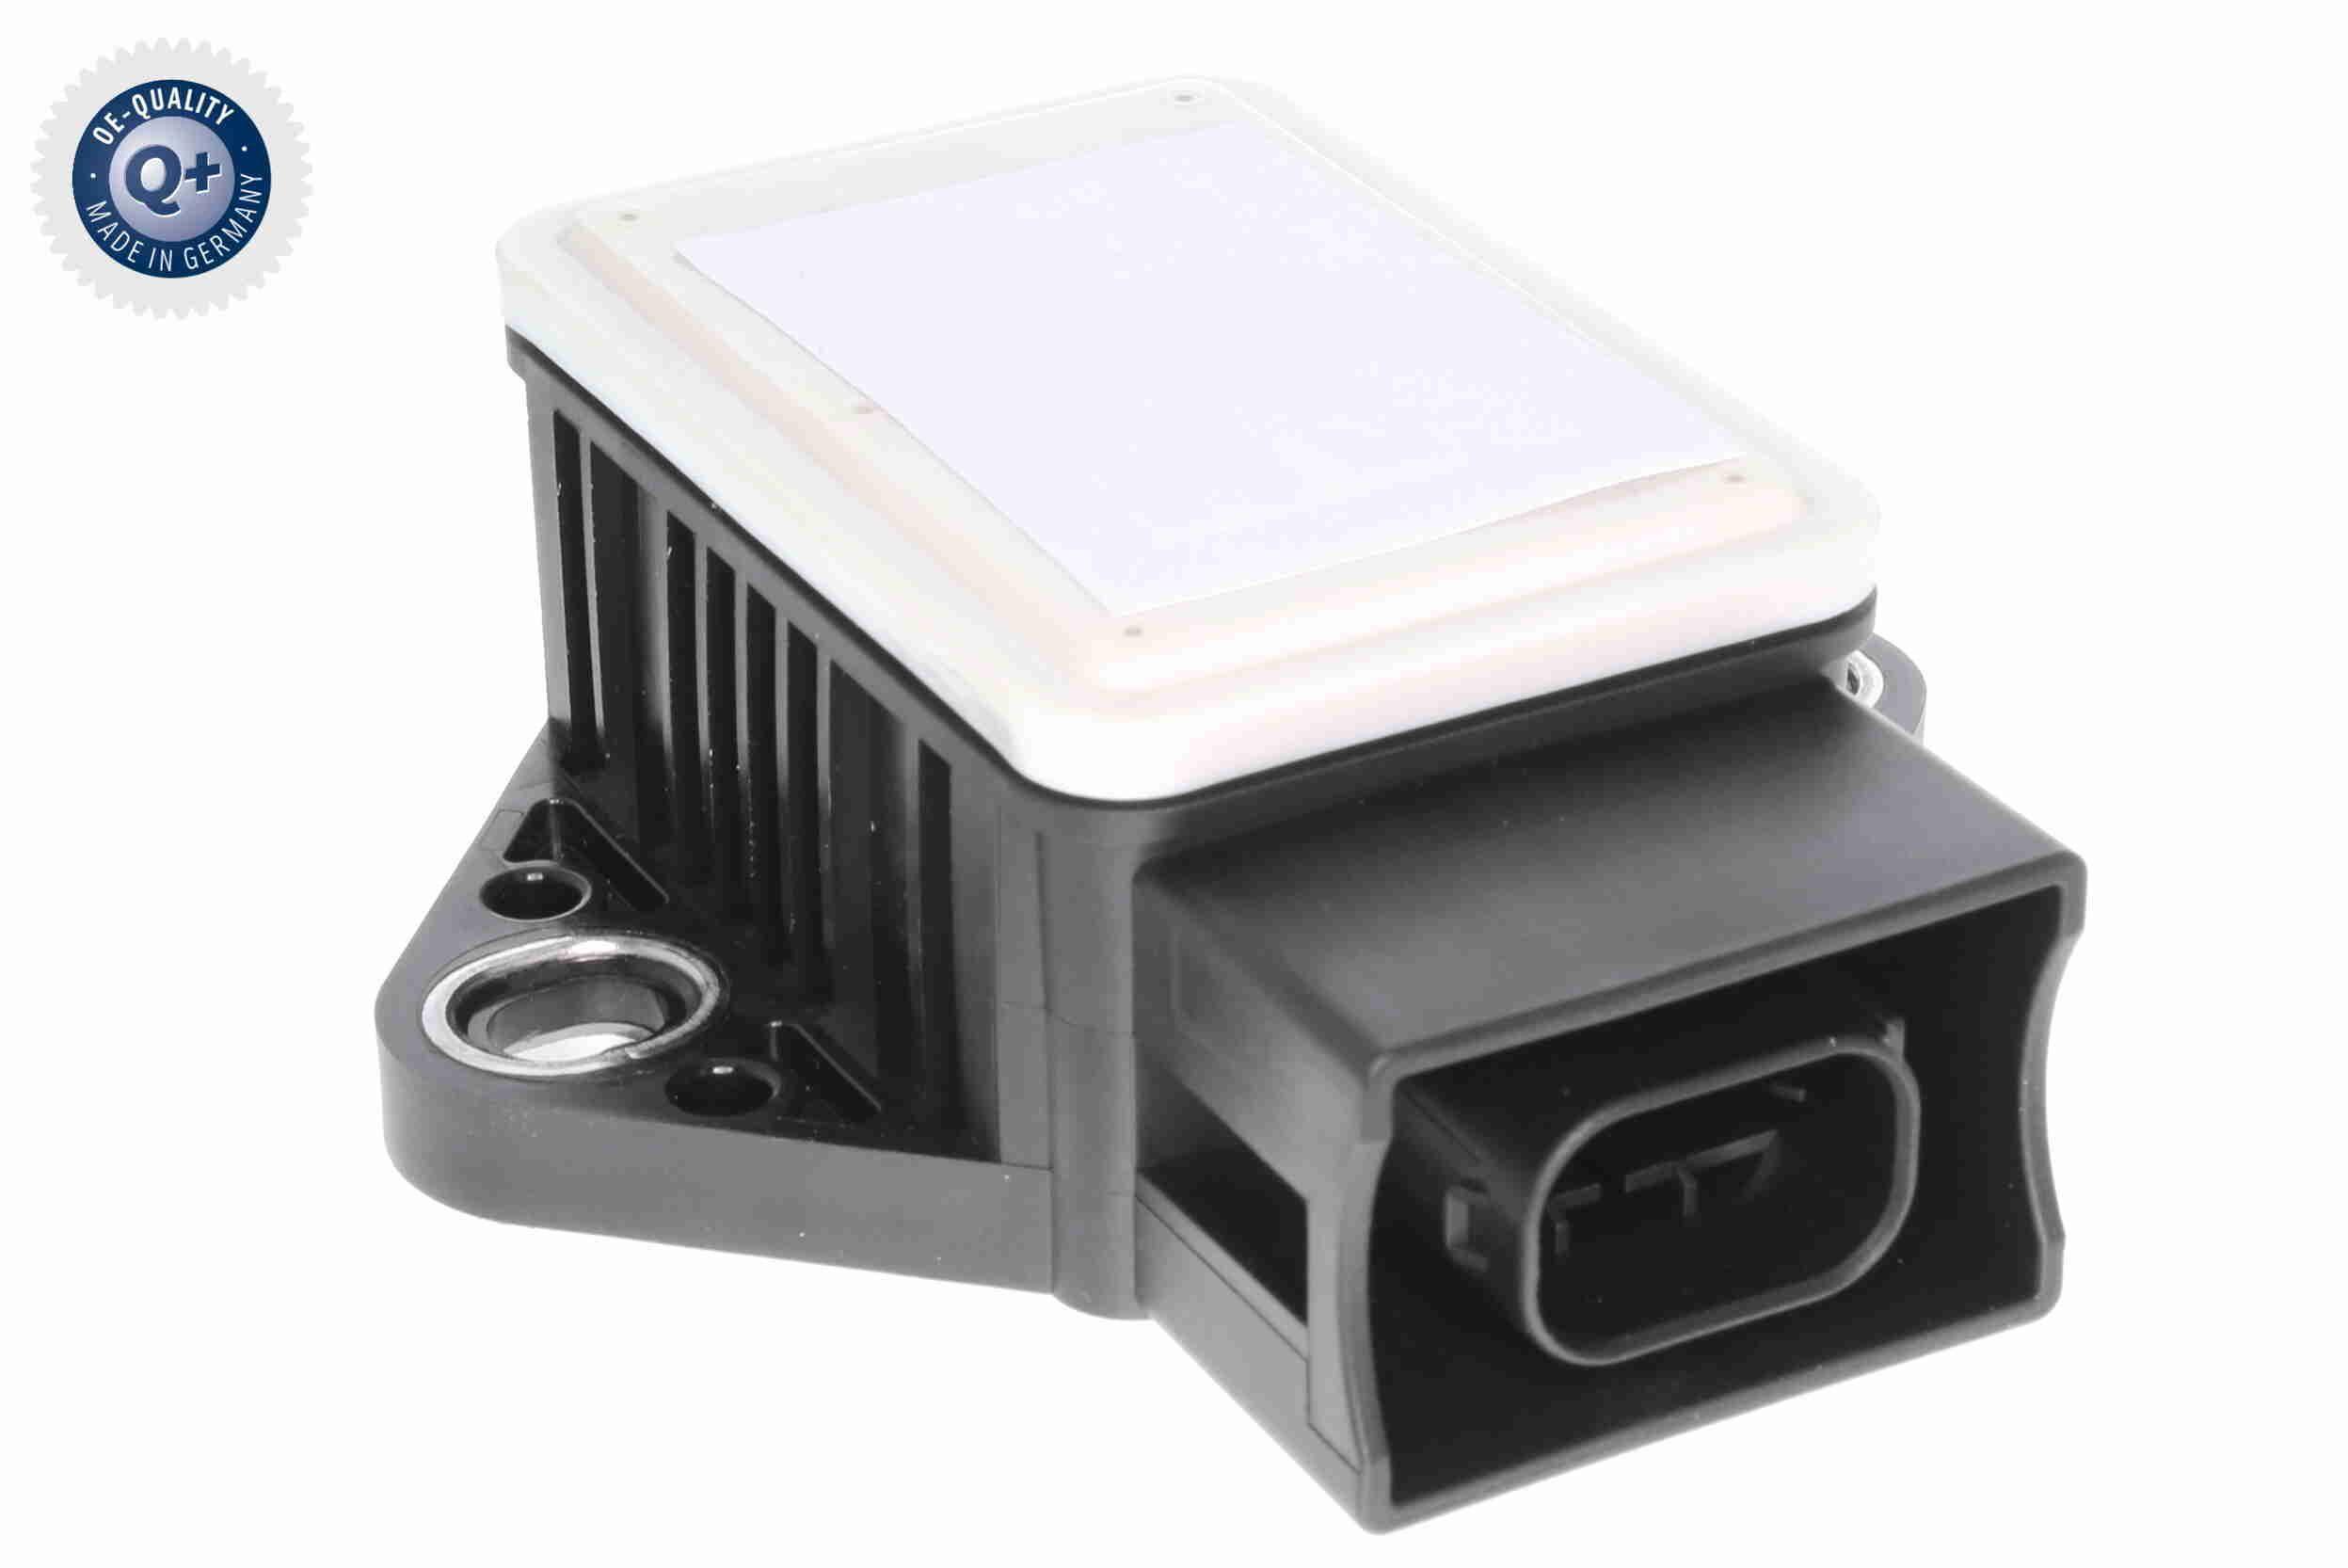 Sensore imbardata V46-72-0134 acquista online 24/7